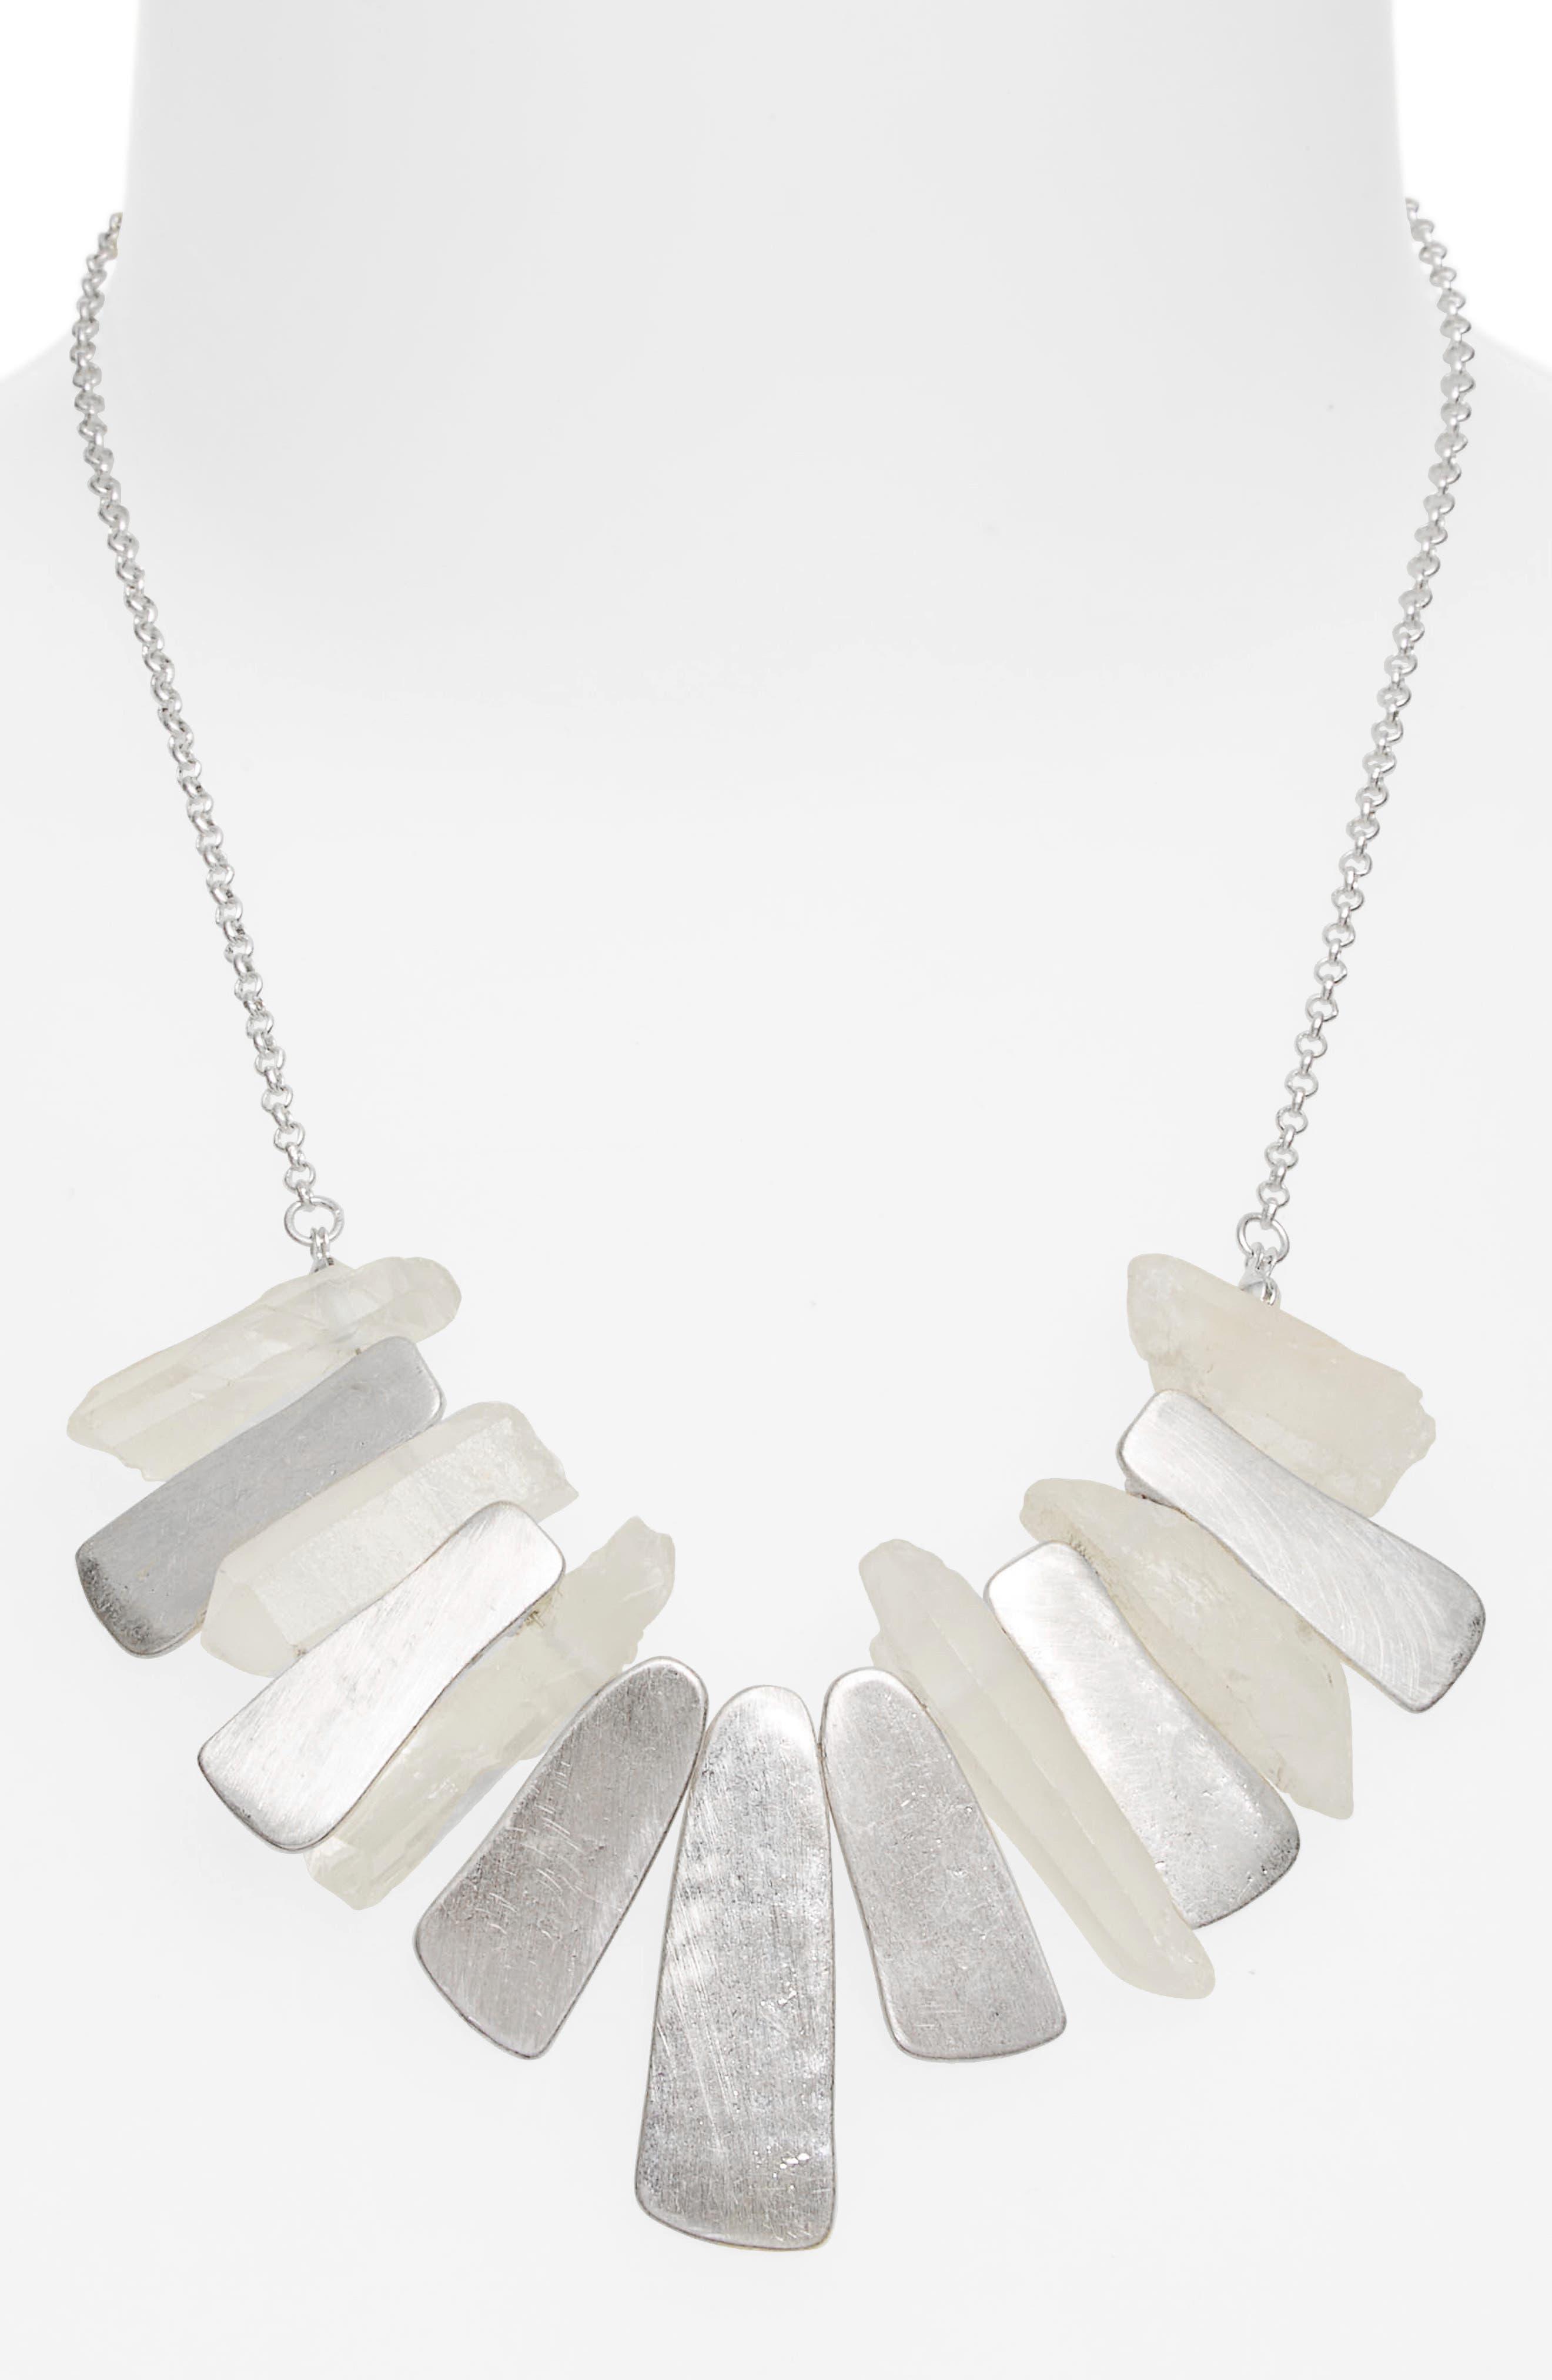 Pyrite Stone Necklace,                             Alternate thumbnail 2, color,                             White/ Silver